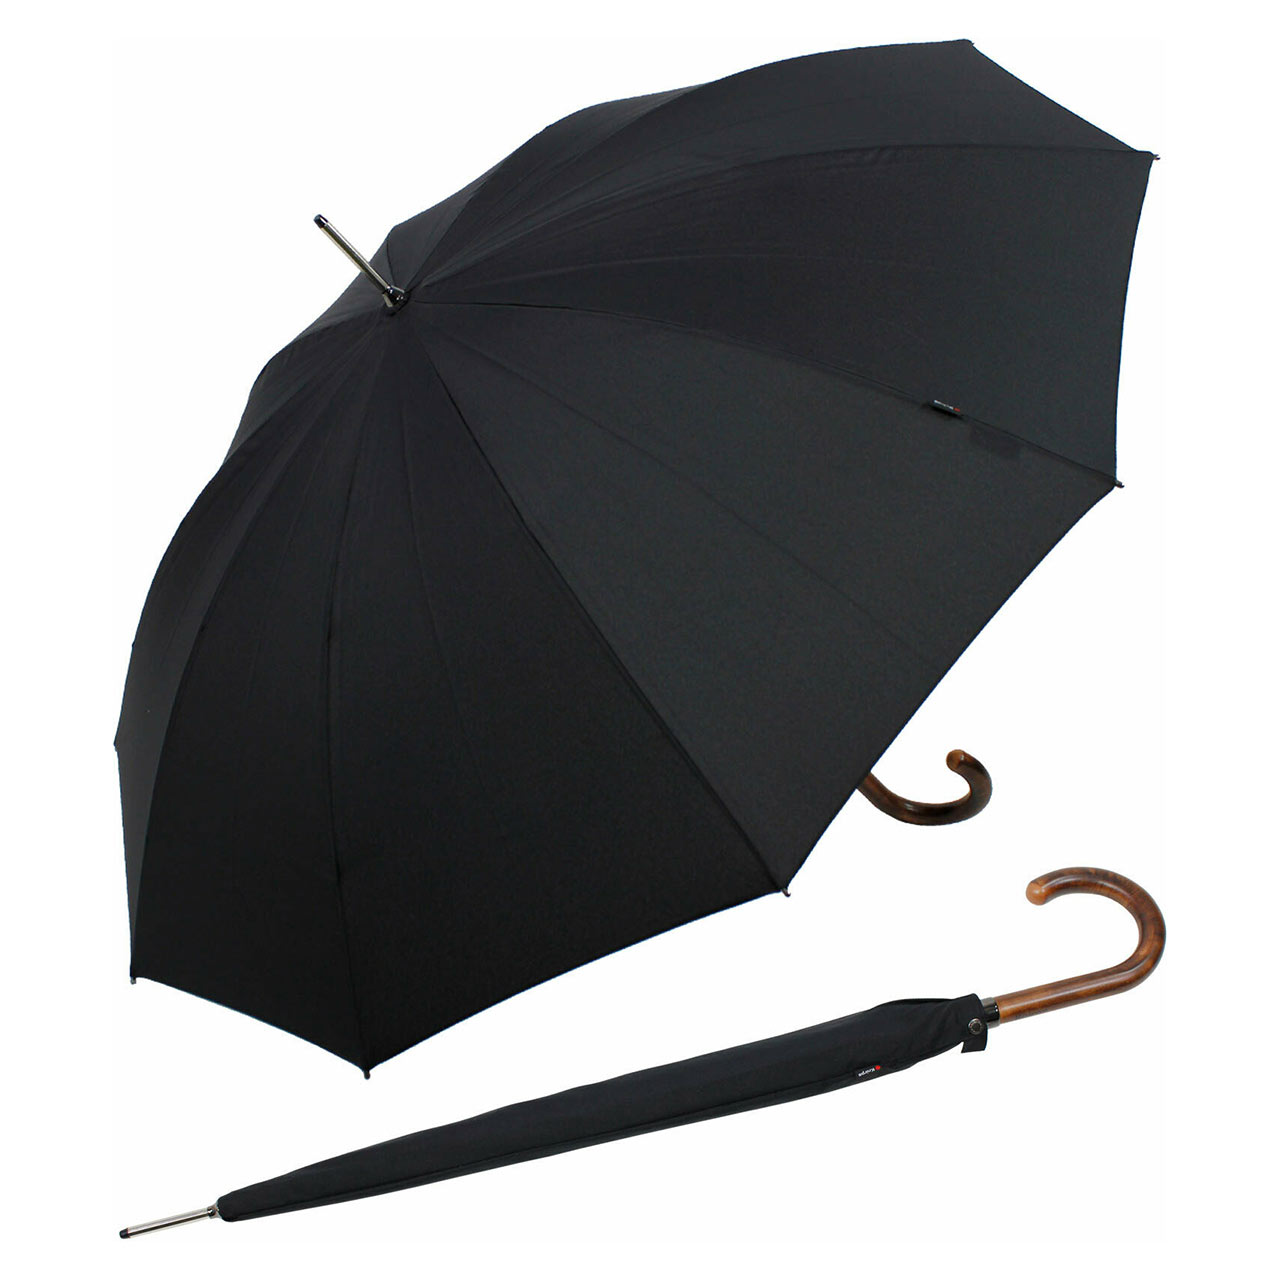 KNIRPS stick umbrella SL 923 Black   the design gift shop